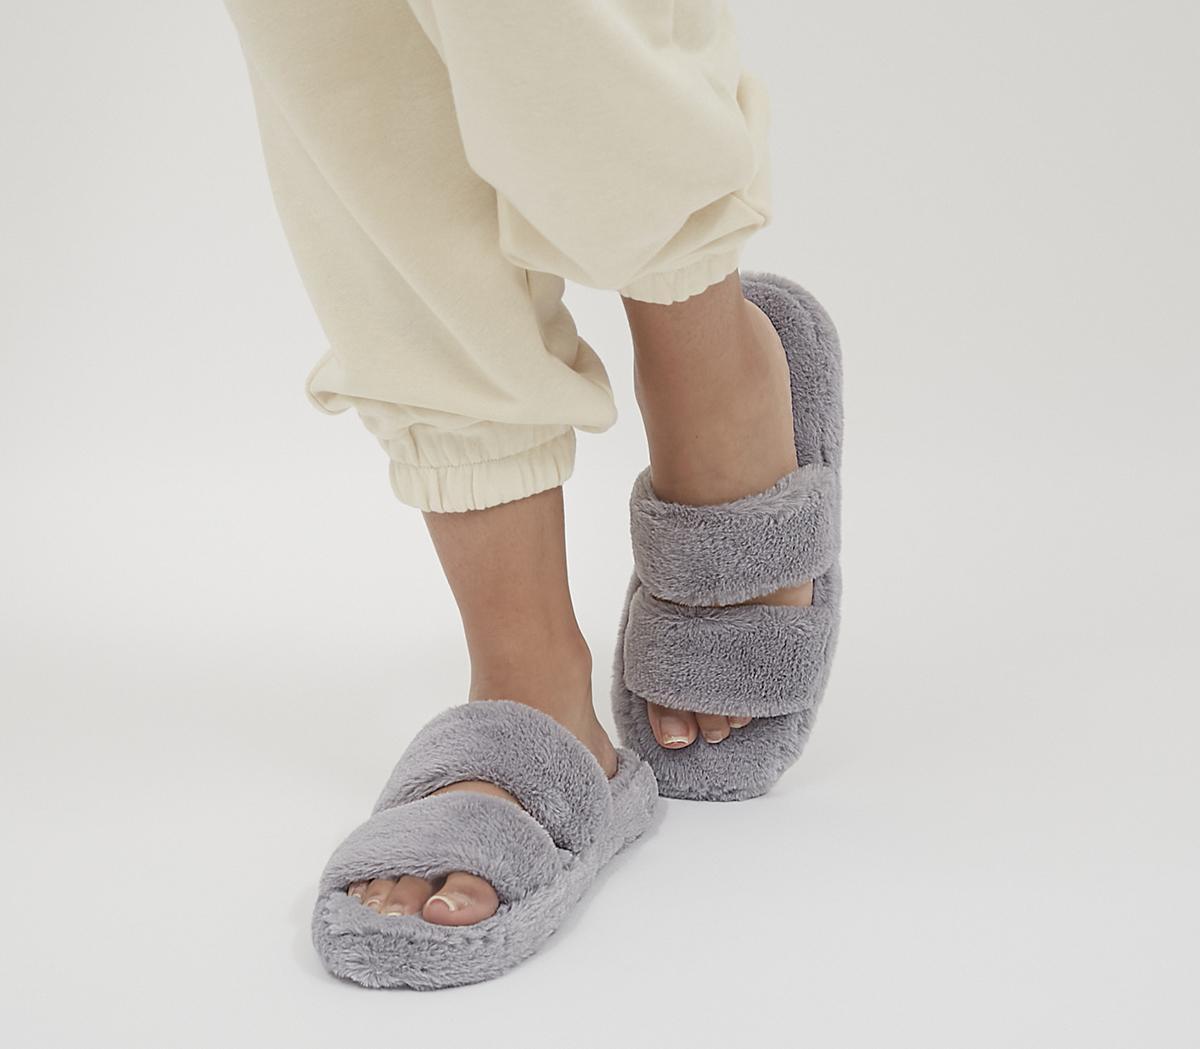 Ferris Double Strap Slippers